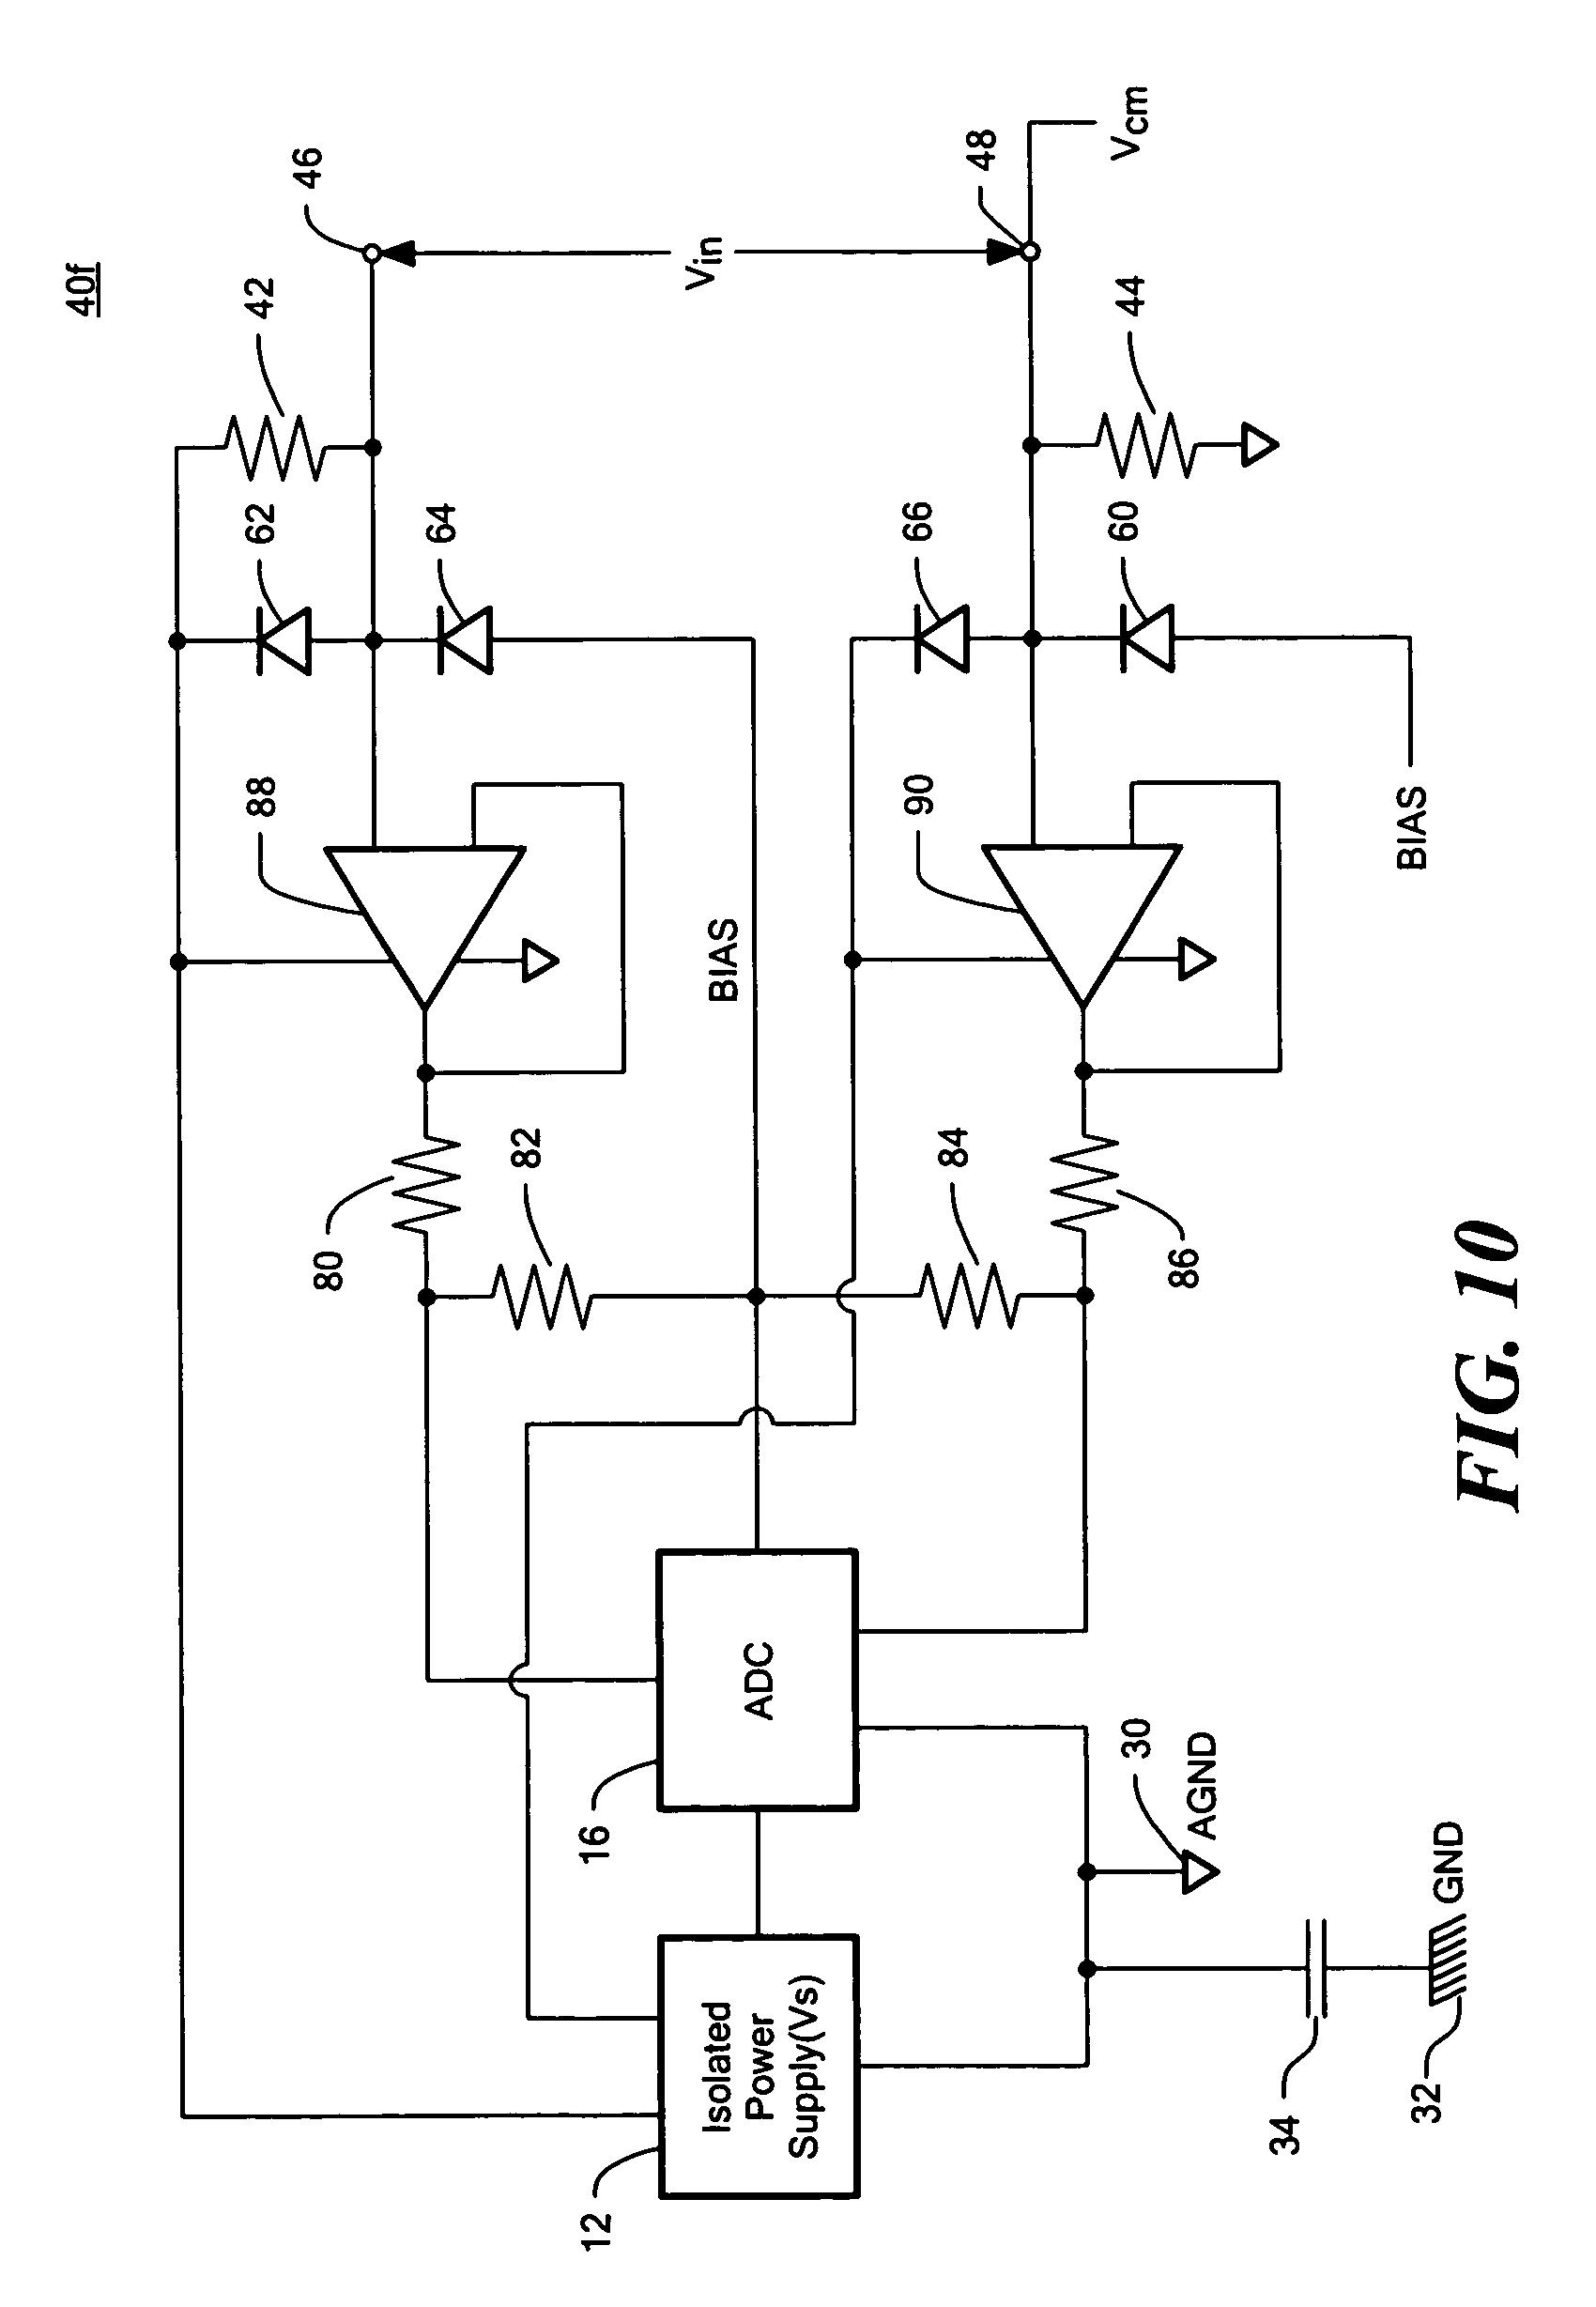 1756 if6i wiring diagram 2004 jeep grand cherokee radio ir6i if8